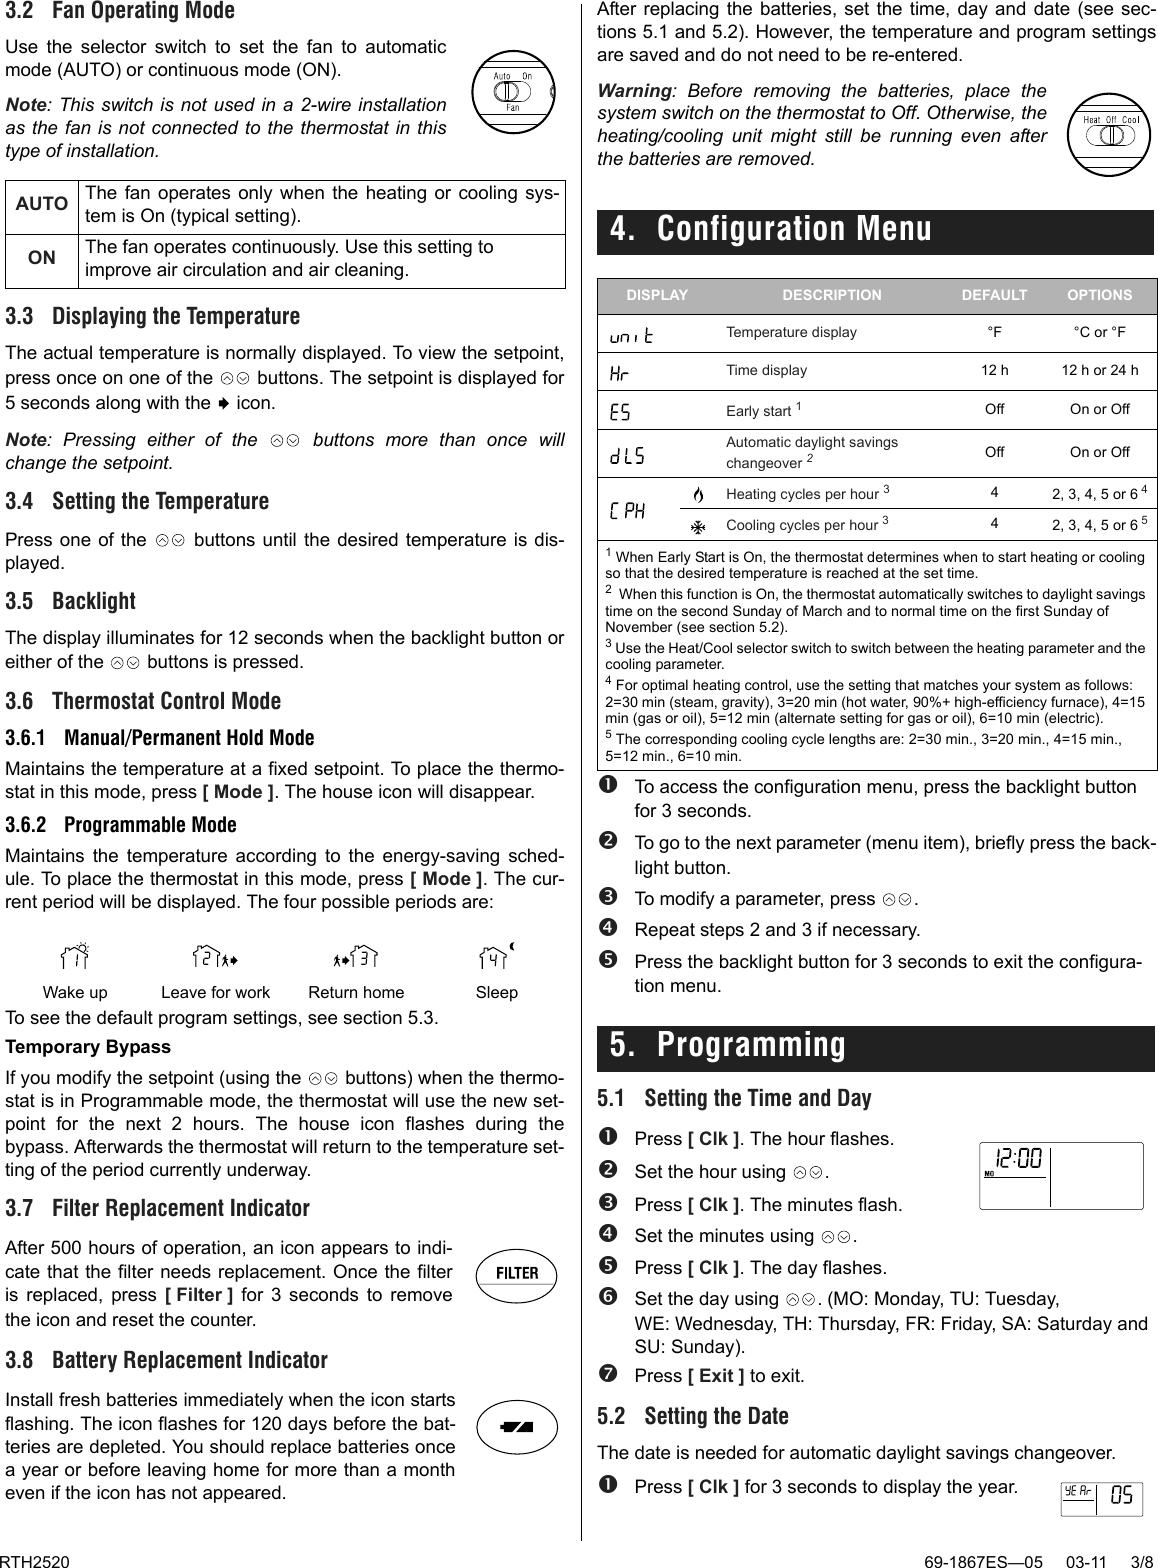 honeywell rth2520b user guide 69 1867es 05 rth2520 programmable rh usermanual wiki Honeywell Security Keypad Honeywell Thermostat Programming Manual